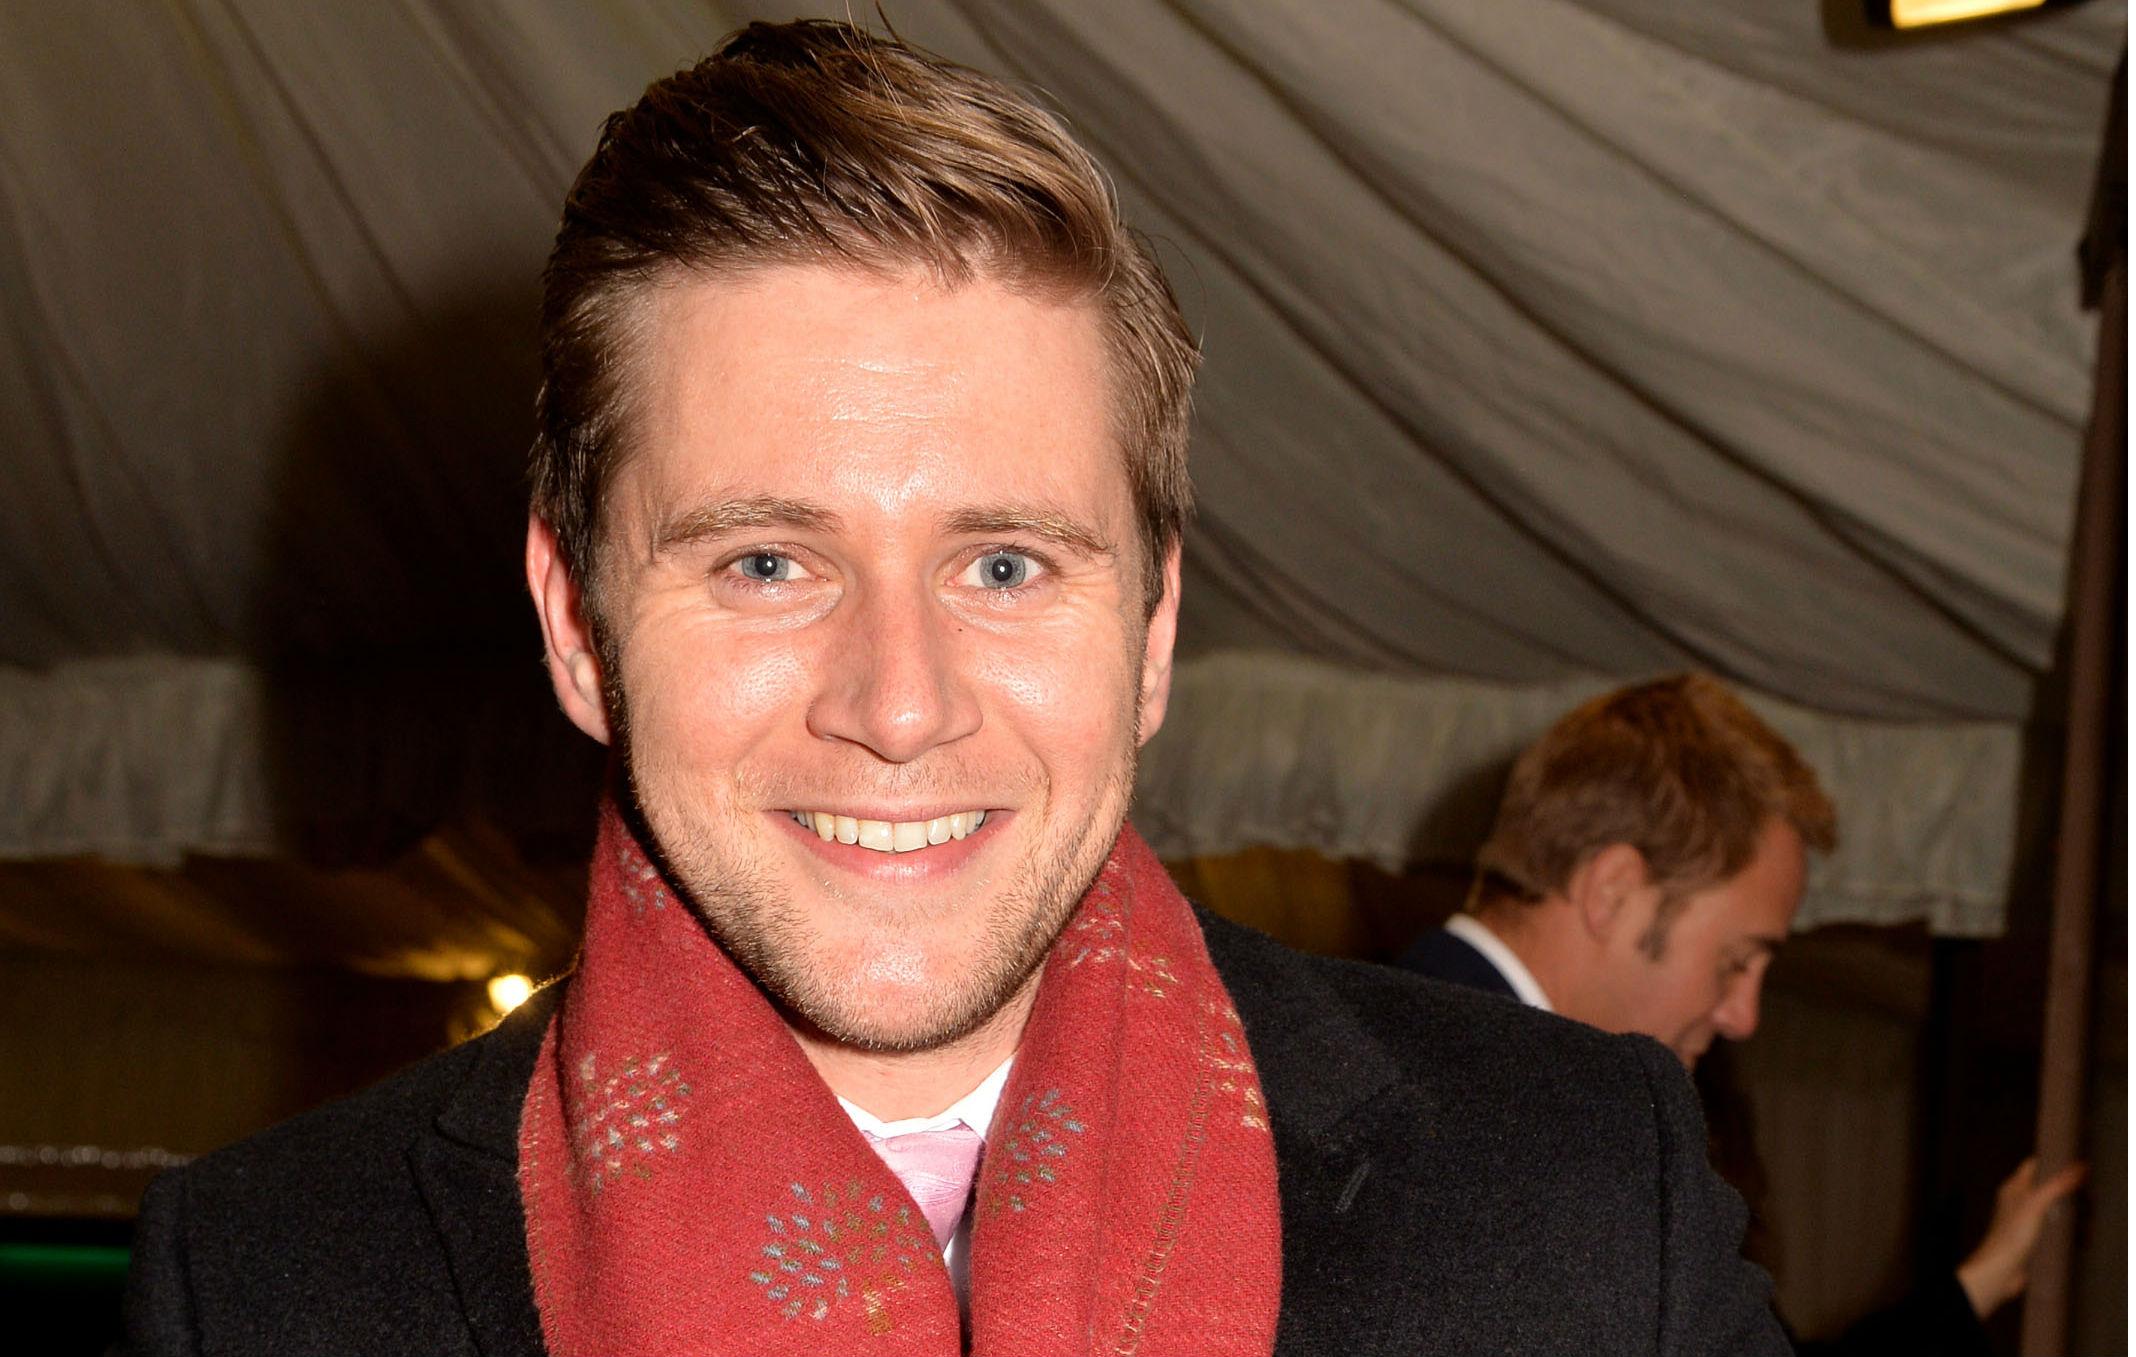 Anca Dumitra downton abbey actor allen leach to star in new bbc drama